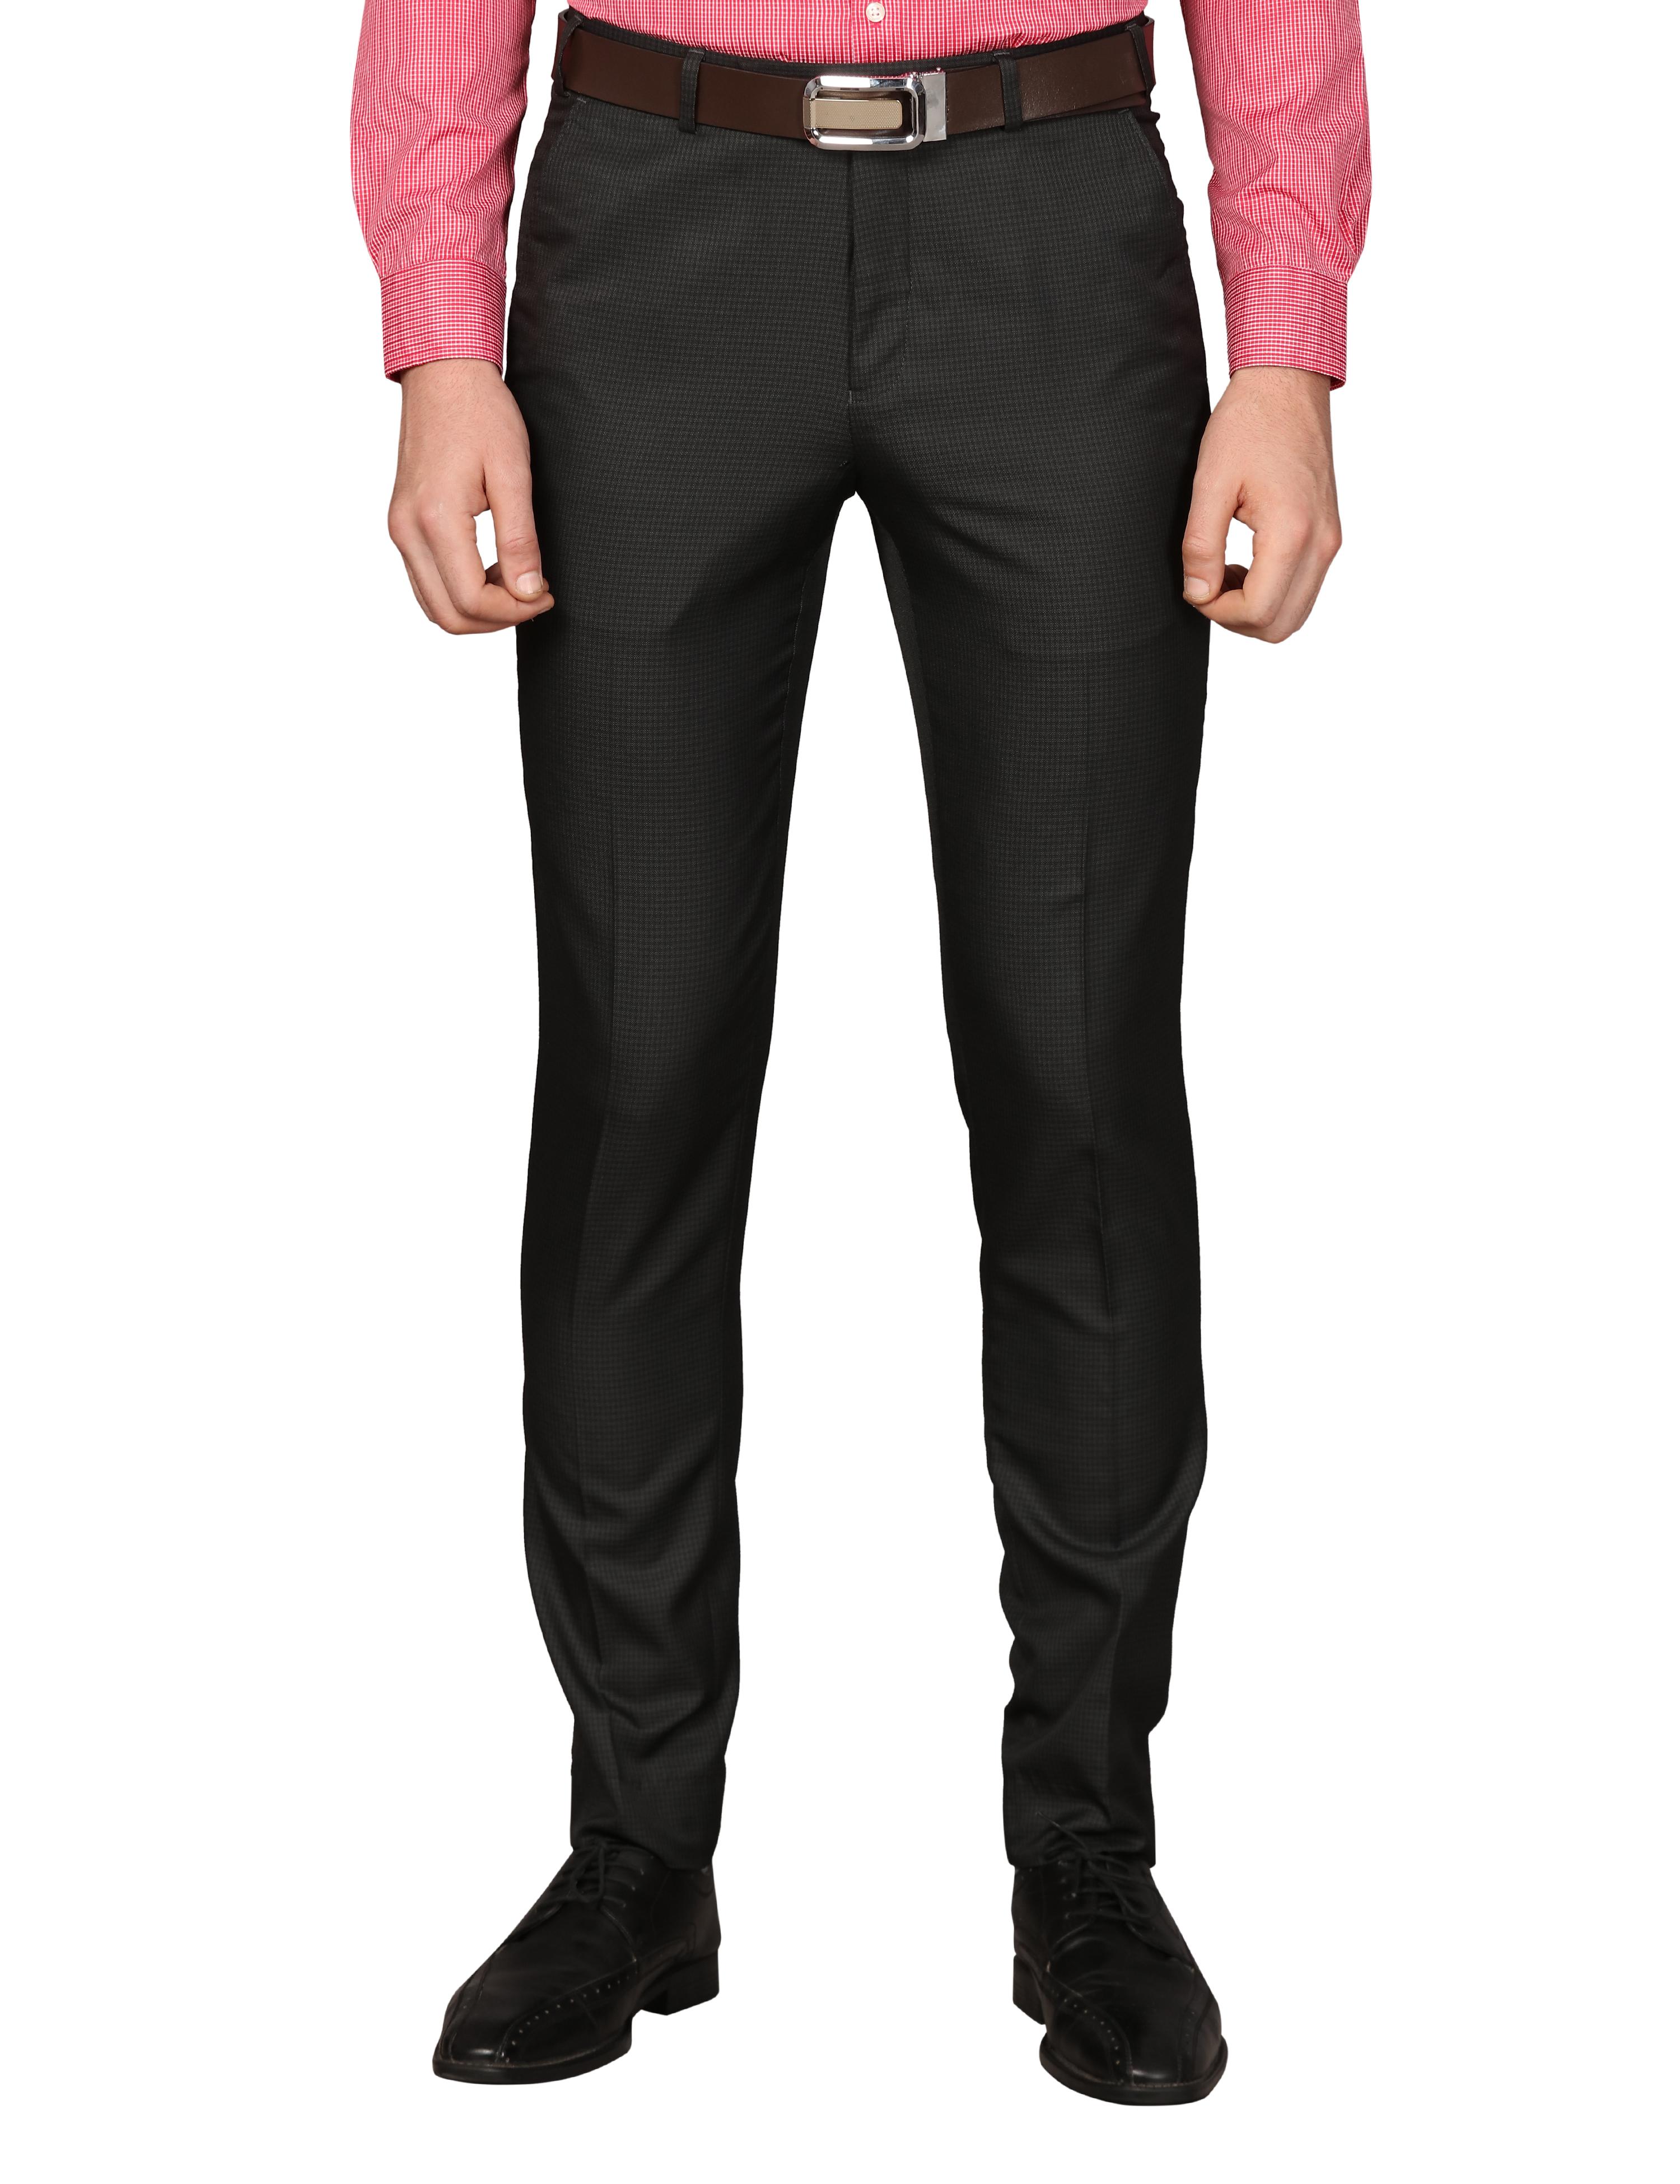 Next Look | Next Look Black Trouser